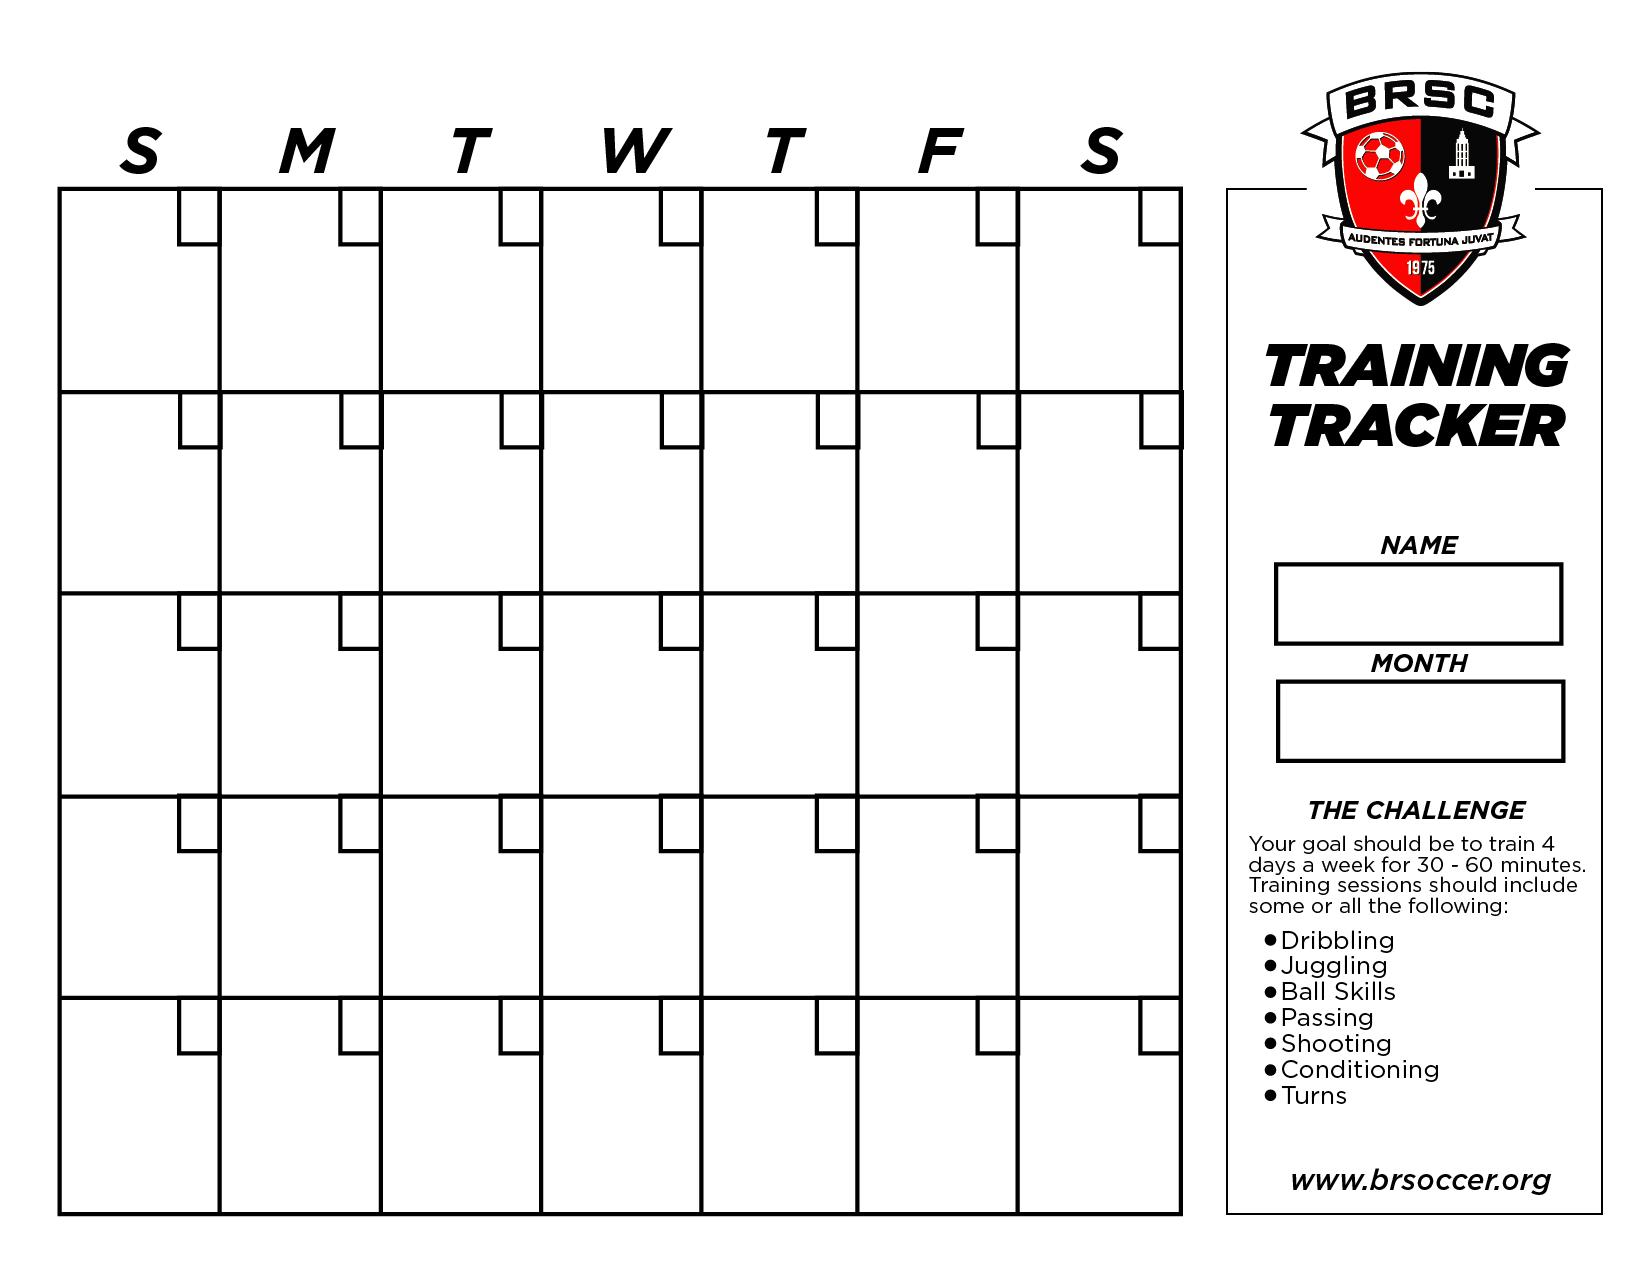 BRSC Training Tracker